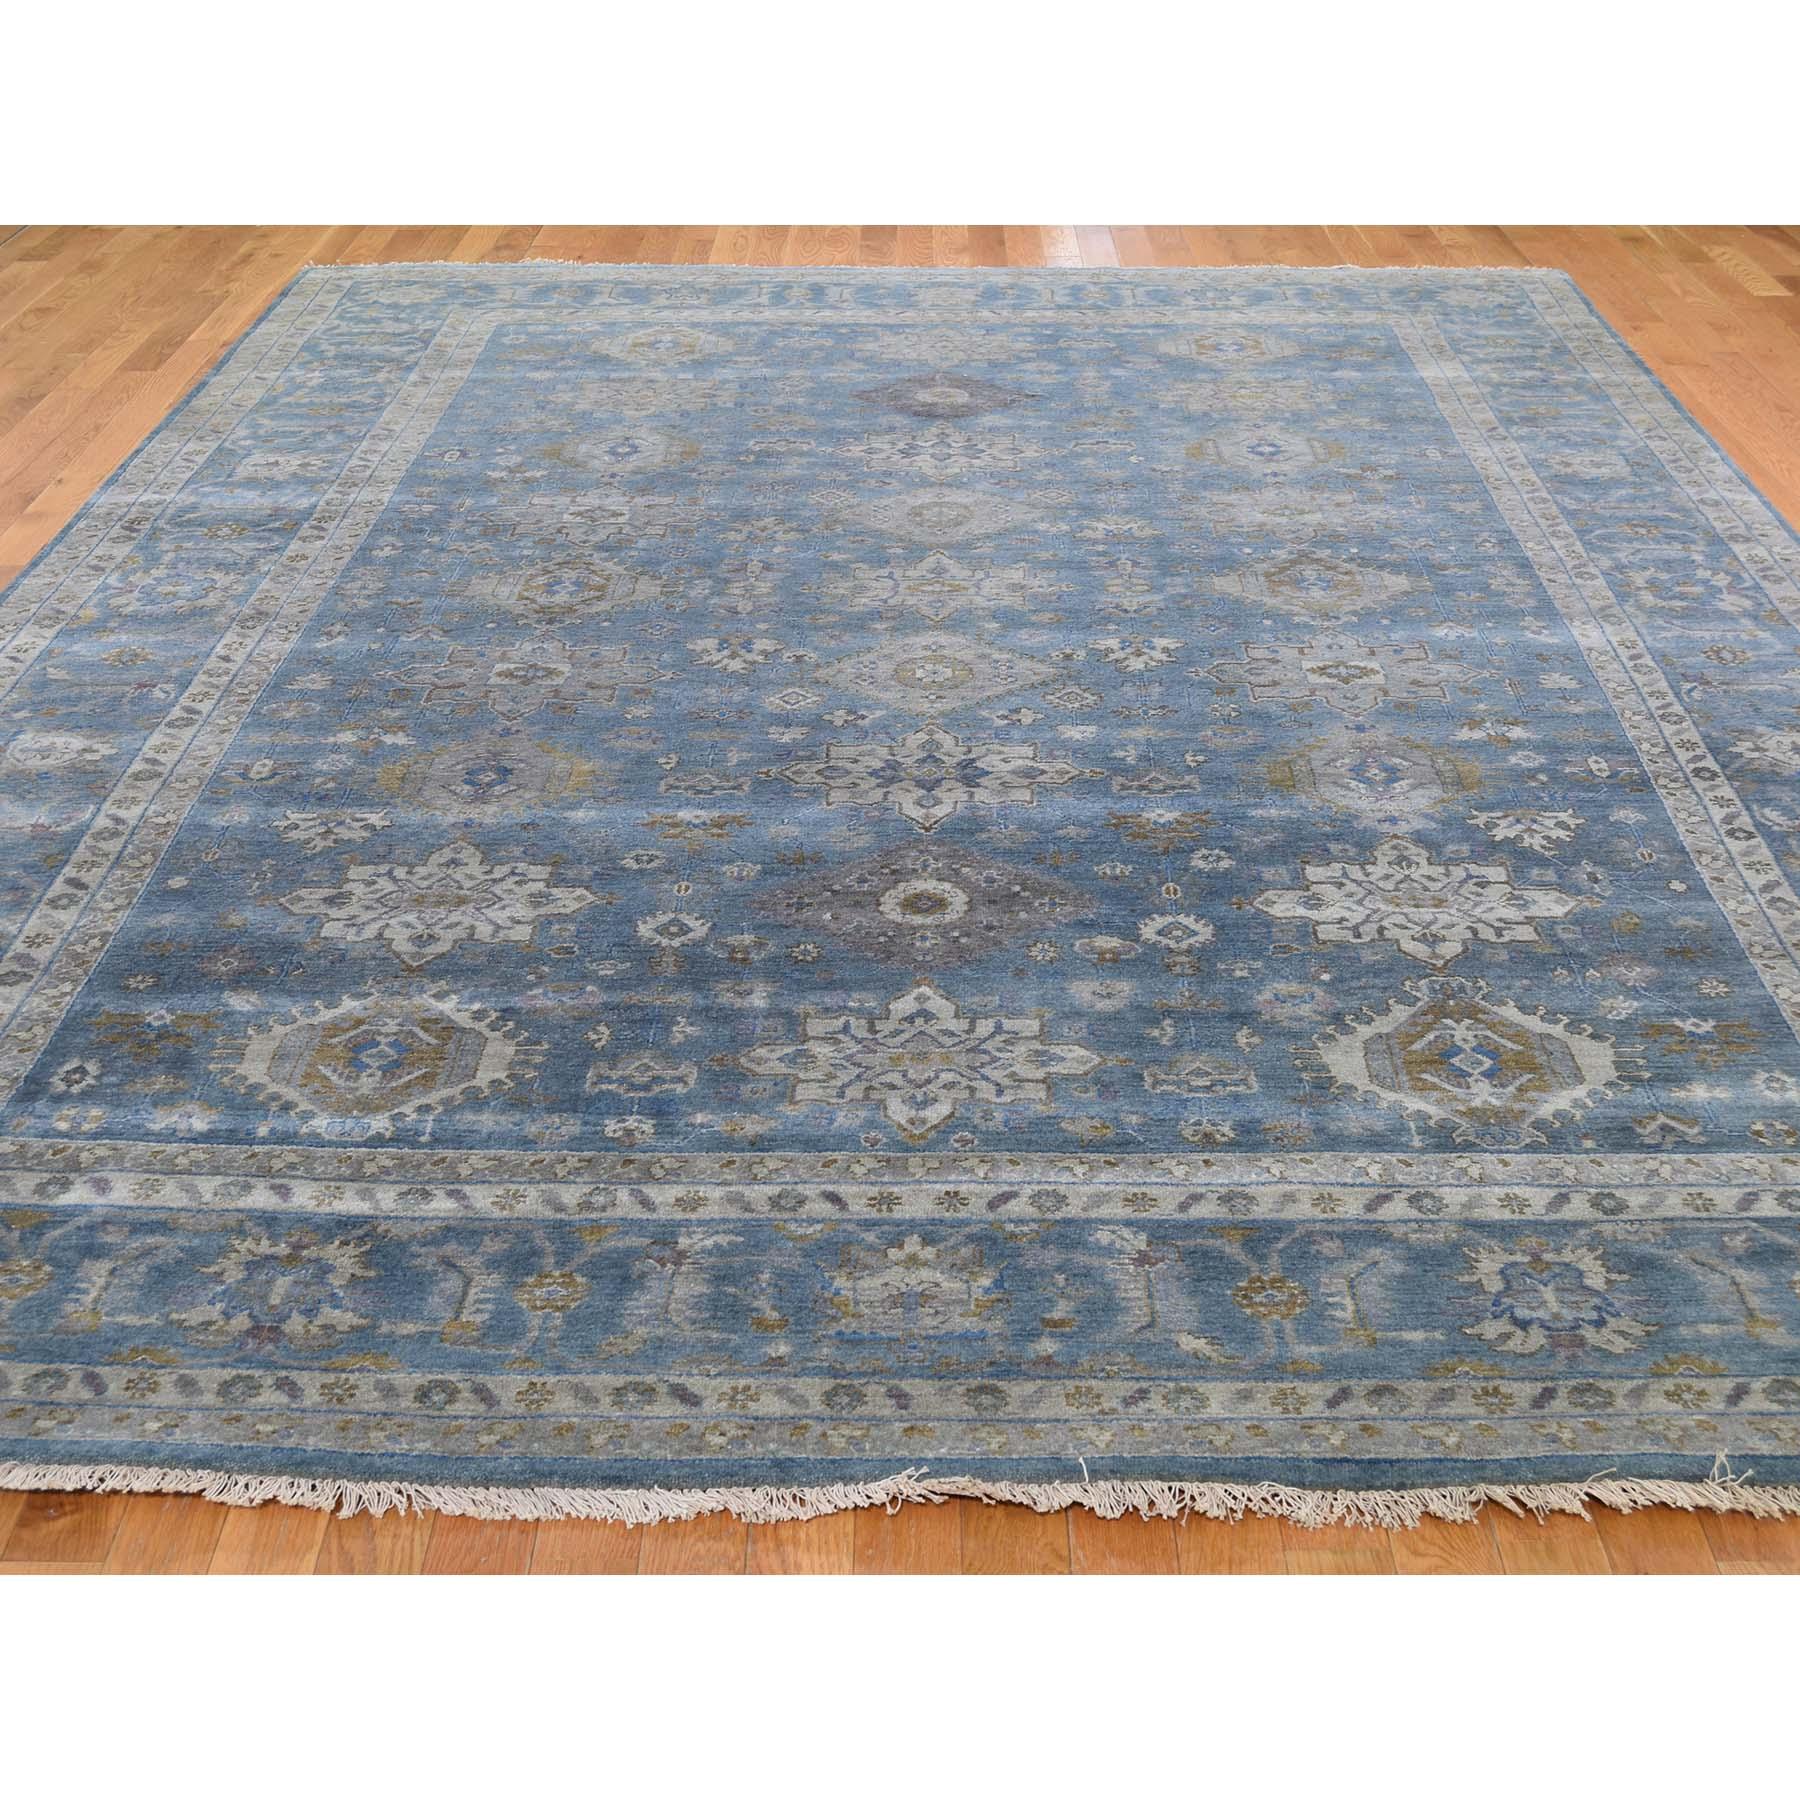 9-x12- Blue Karajeh Design Pure Wool Hand-Knotted Oriental Rug